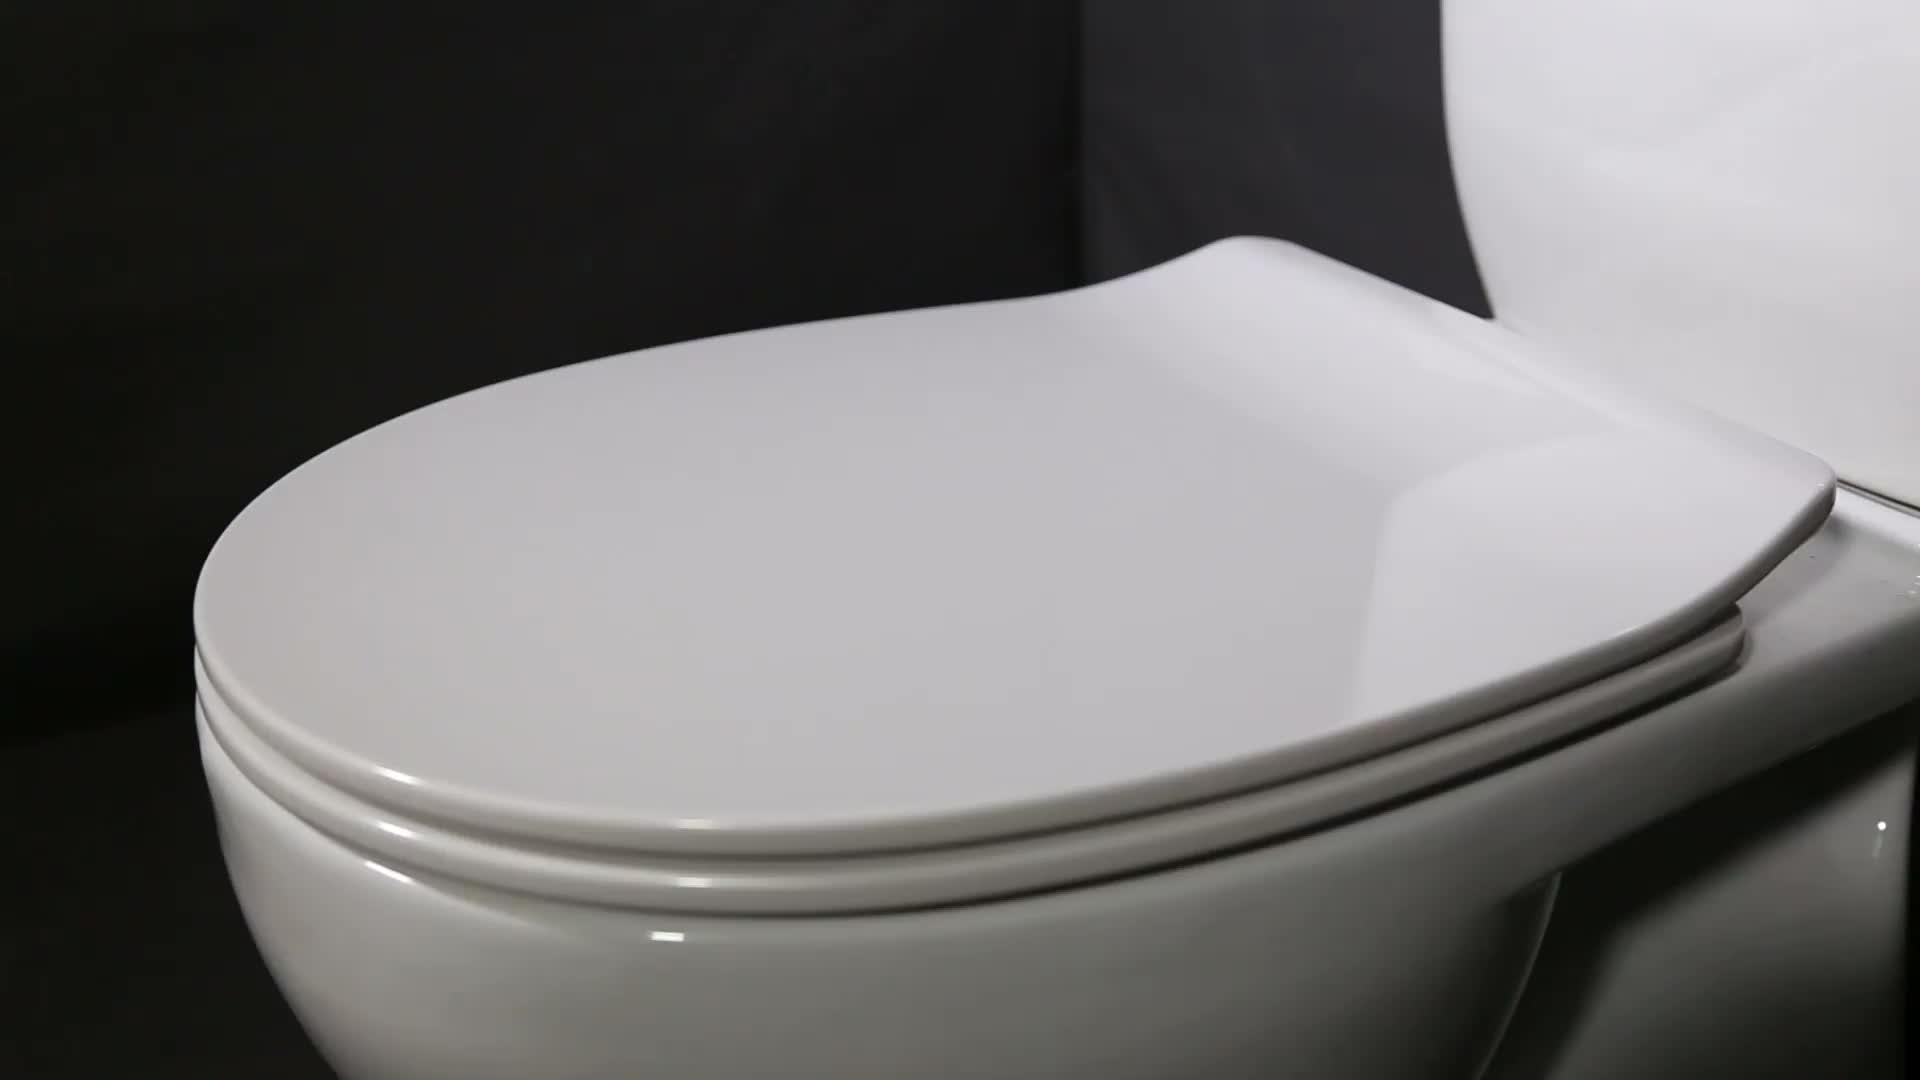 Brilliant Automatic Closing Toilet Seat Automatic Hygienic Wc Seat Lid Buy Automatic Closing Toilet Seat Automatic Wc Seat Hygienic Wc Seat Lid Product On Evergreenethics Interior Chair Design Evergreenethicsorg